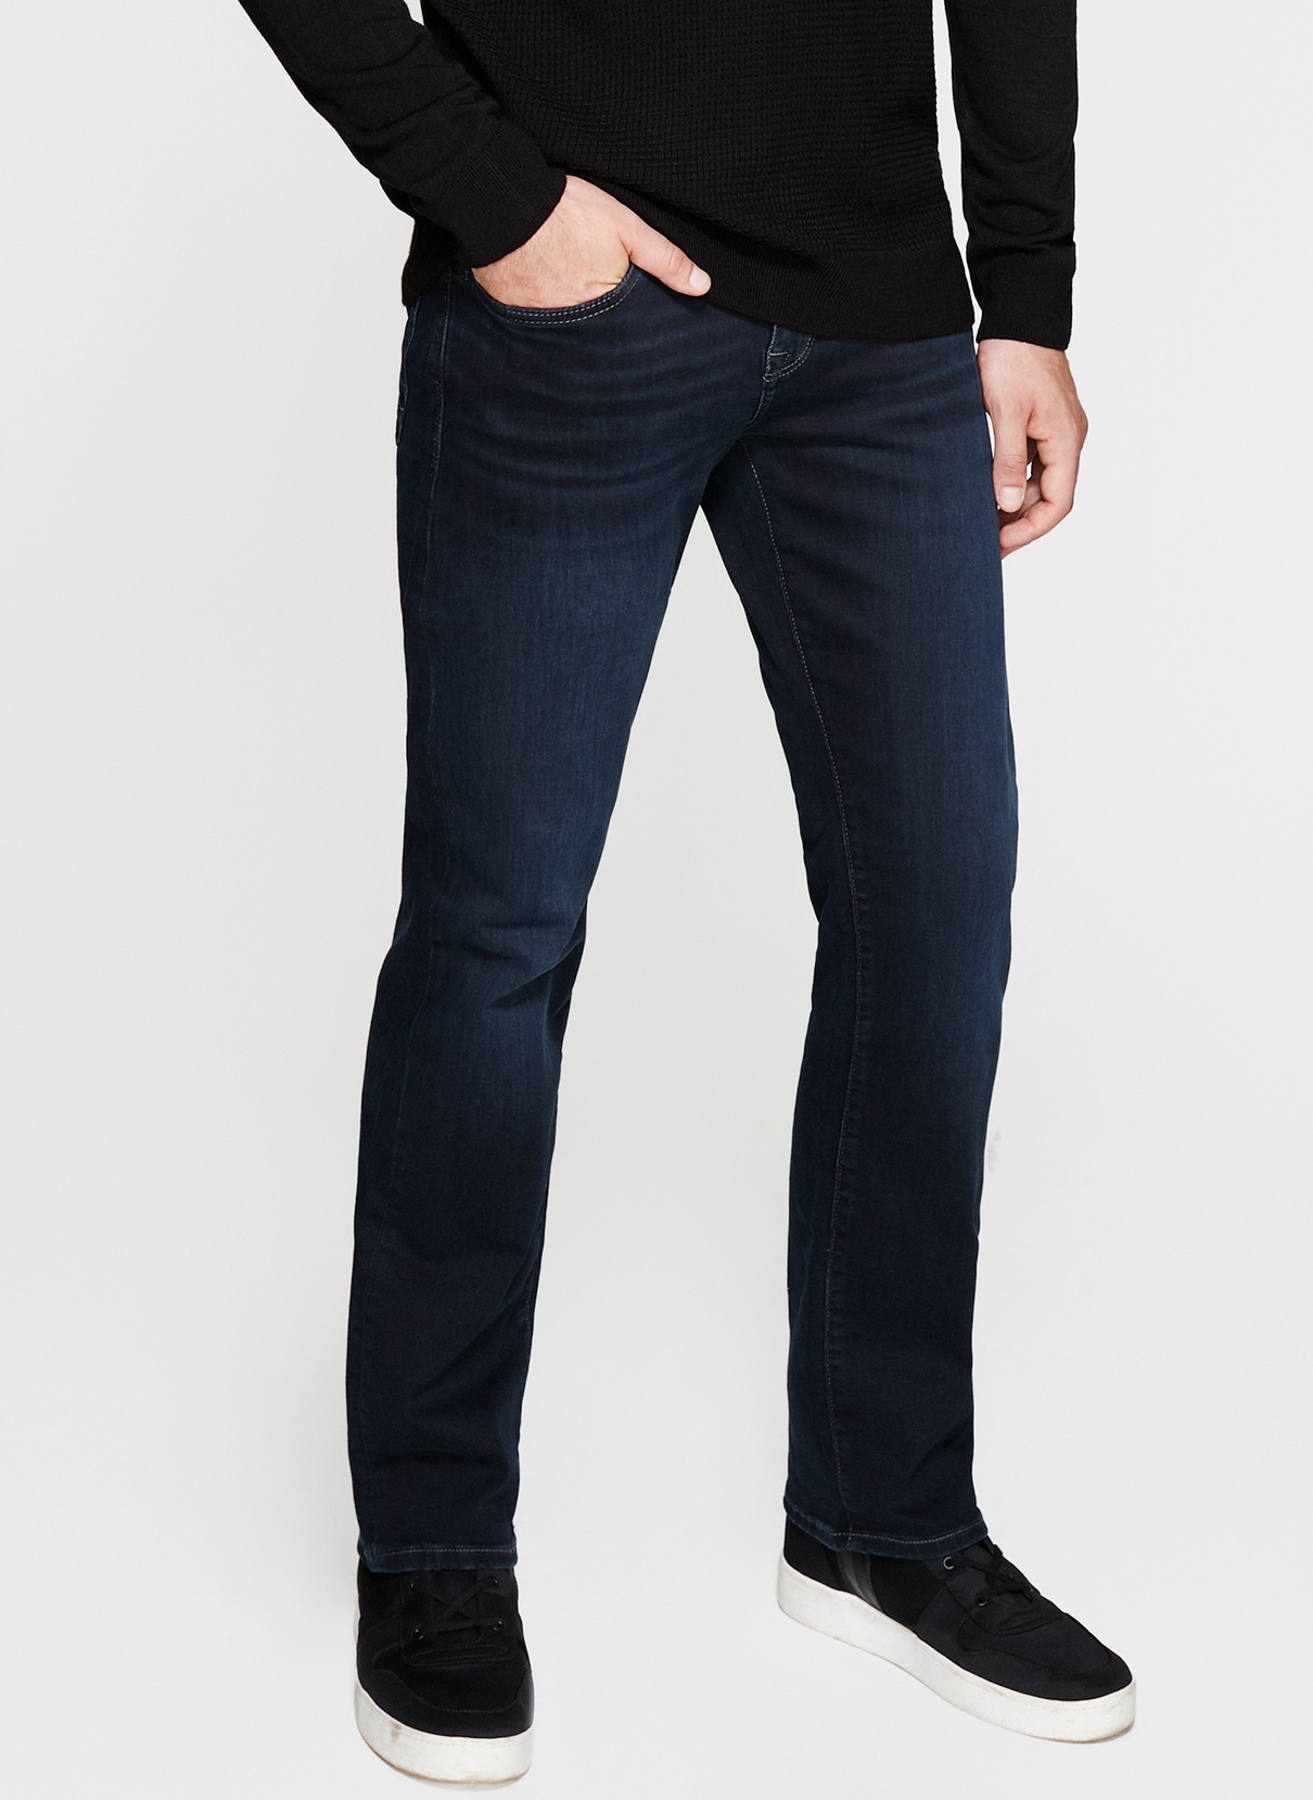 Mavi Klasik Pantolon 31-32 5001634310011 Ürün Resmi